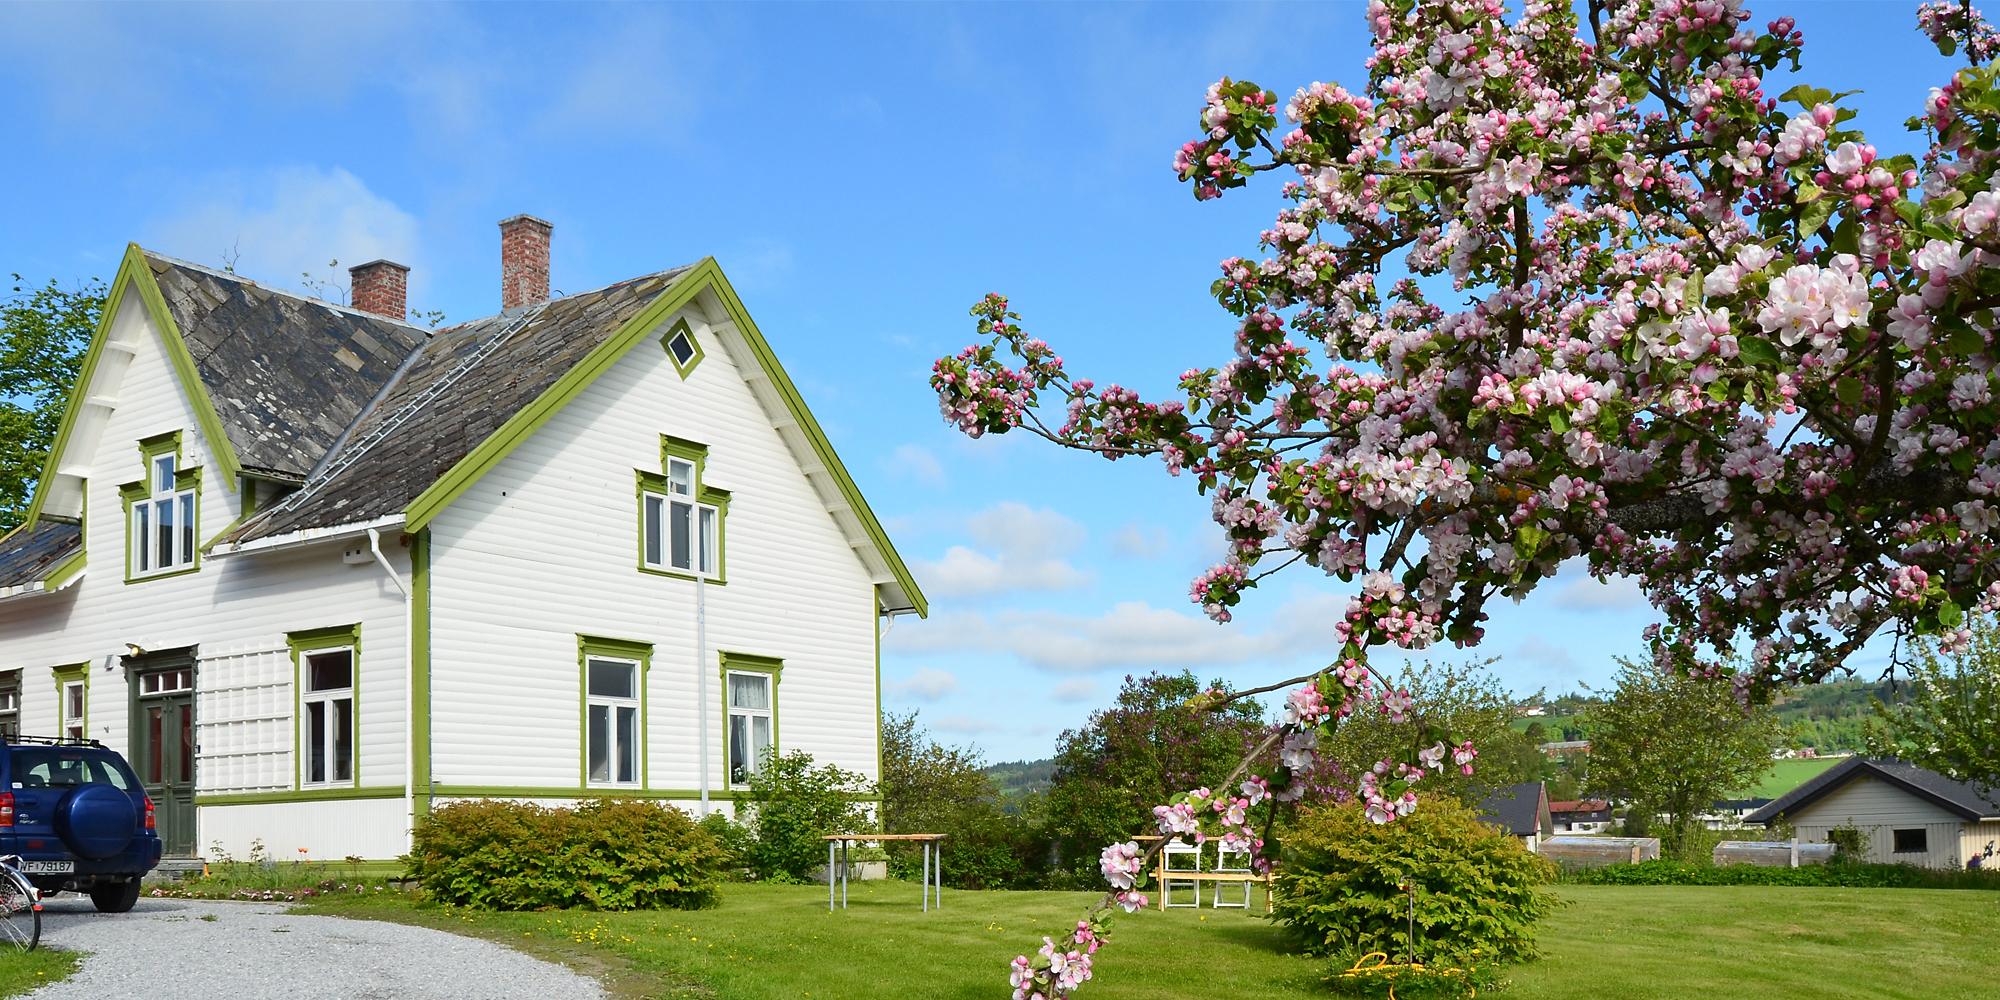 Strømnes, Oldefars hus i Straumen langs Den Gyldne Omvei. Copyright: Strømnes